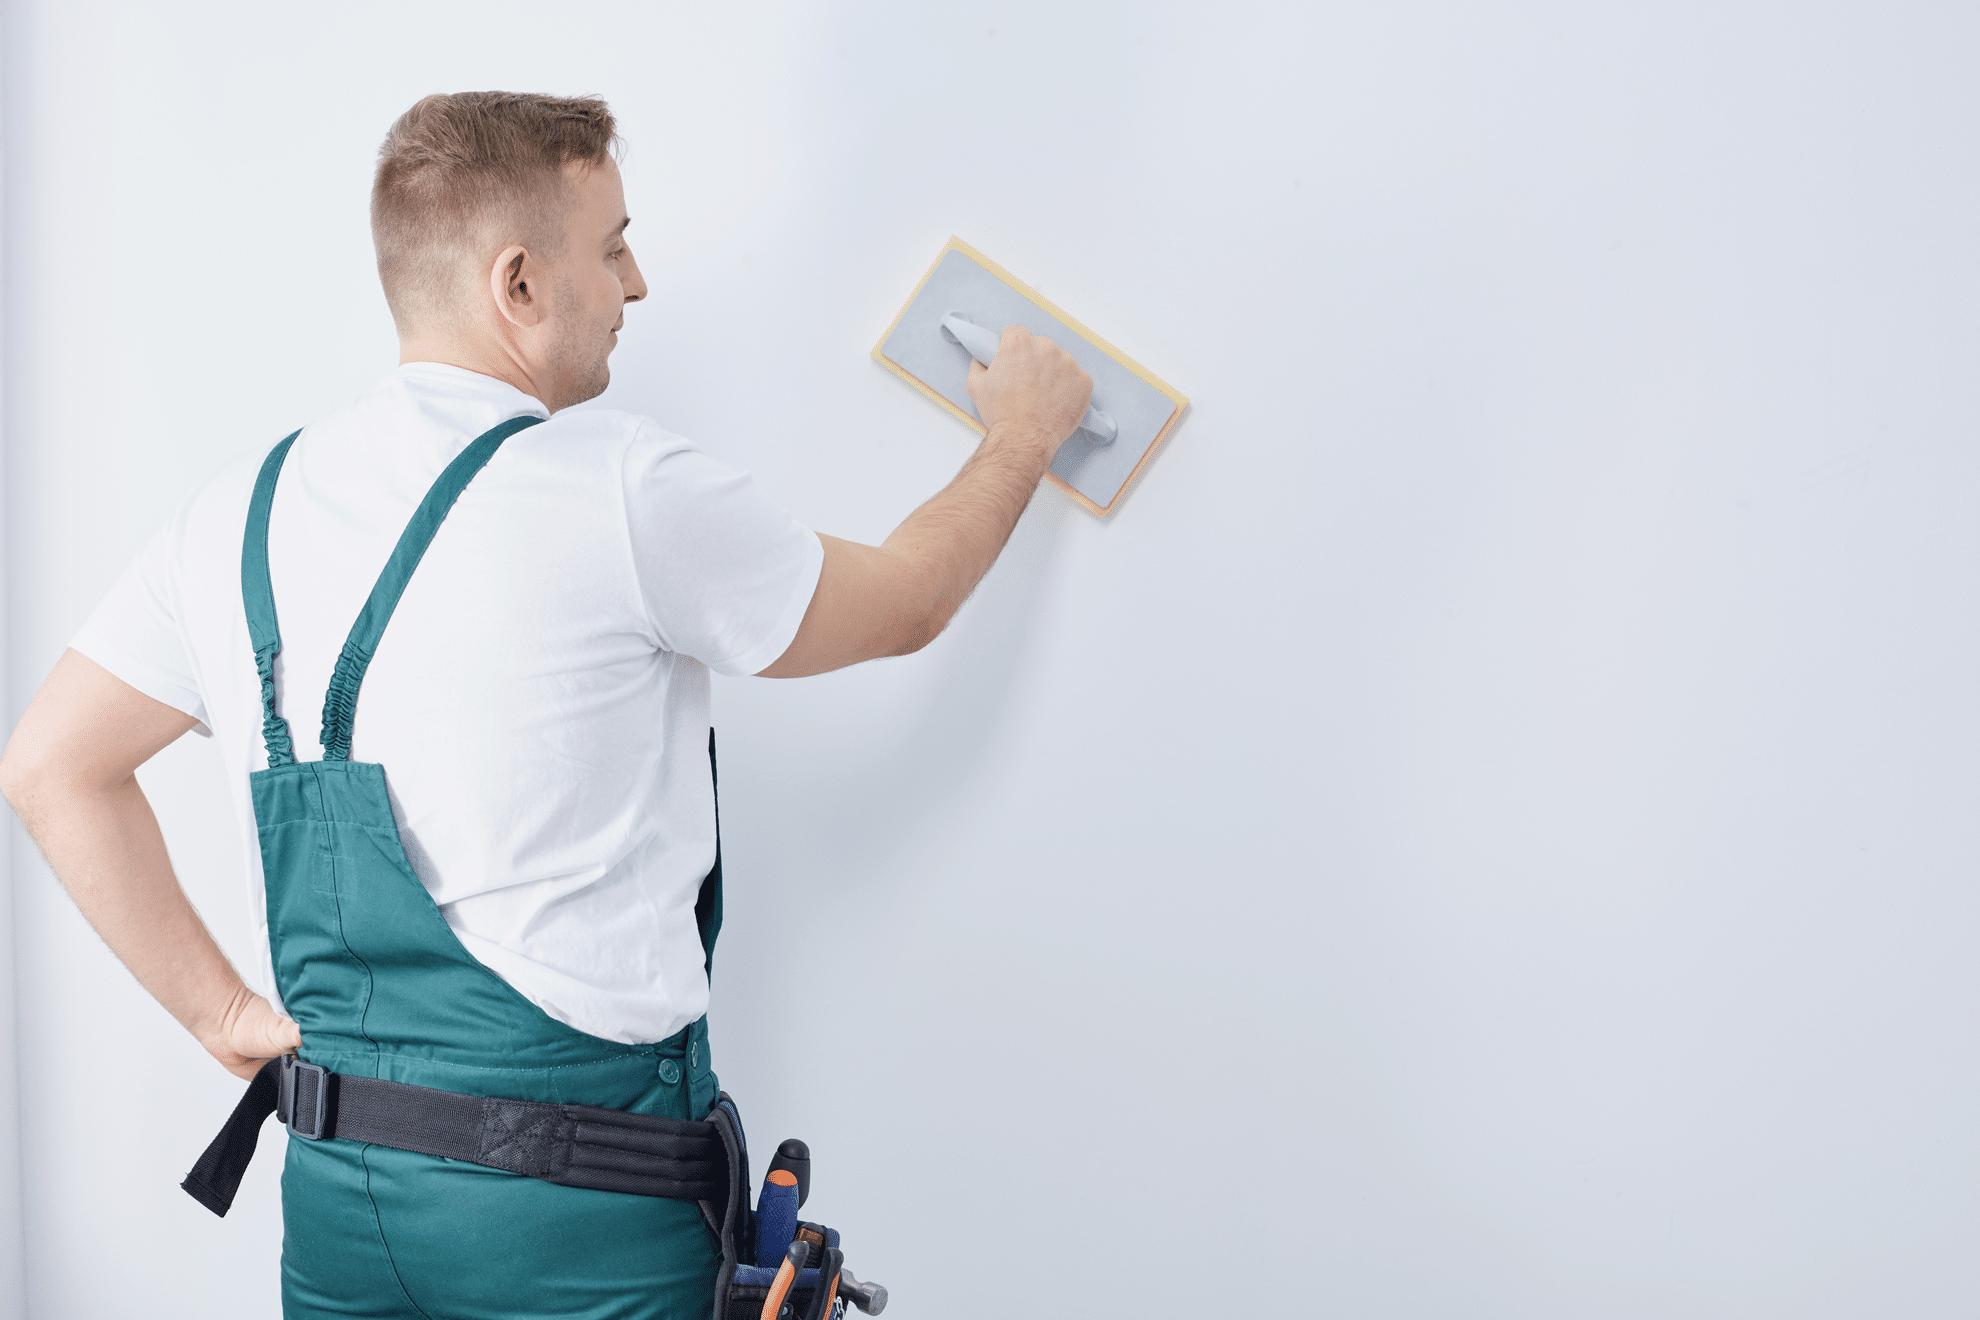 Jeune homme expermente renove mur